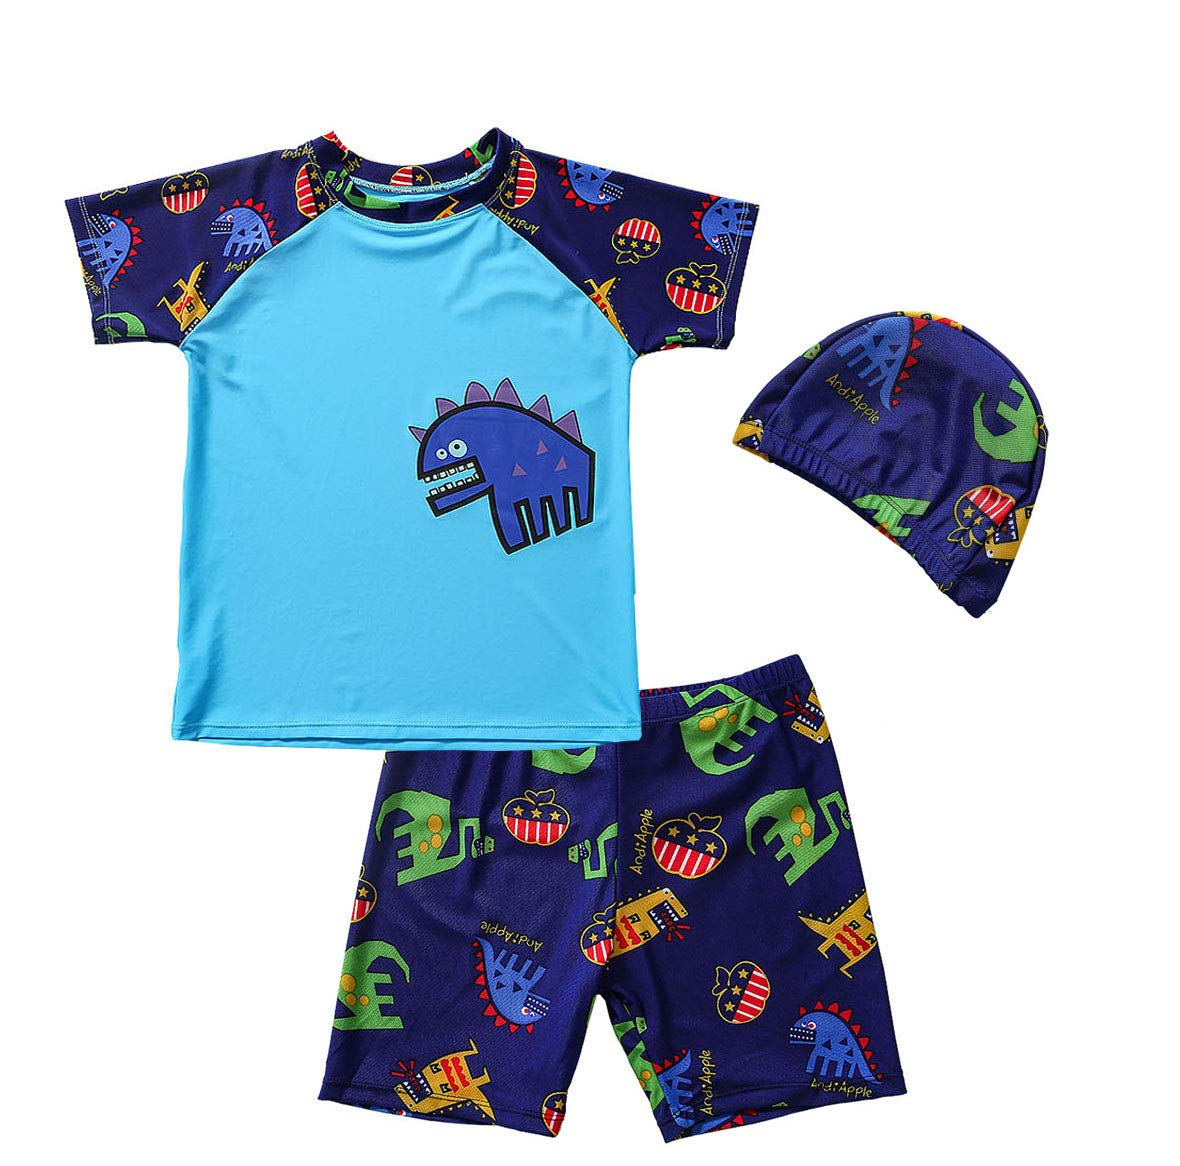 Baby Toddlers Boys Two Pieces Swimwear Set Kids Swimsuit Beach Bathing Suit  Dinosaur Shark Long Sleeve Rash Guard